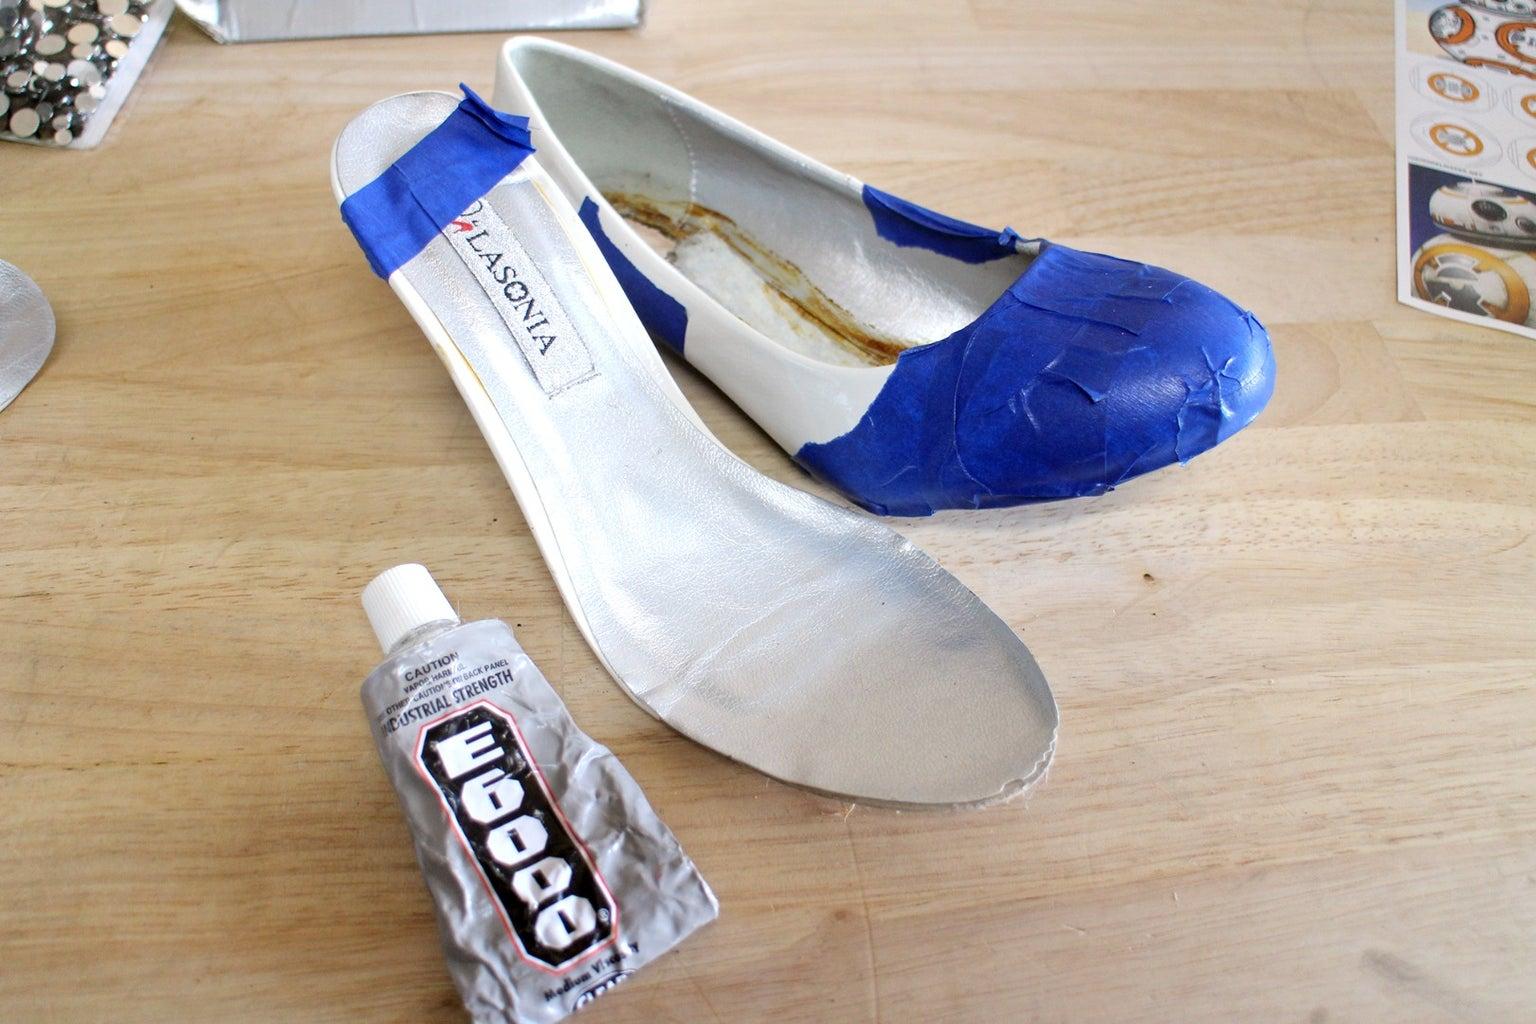 New Heel Post - Gluing Insert Into Shoe